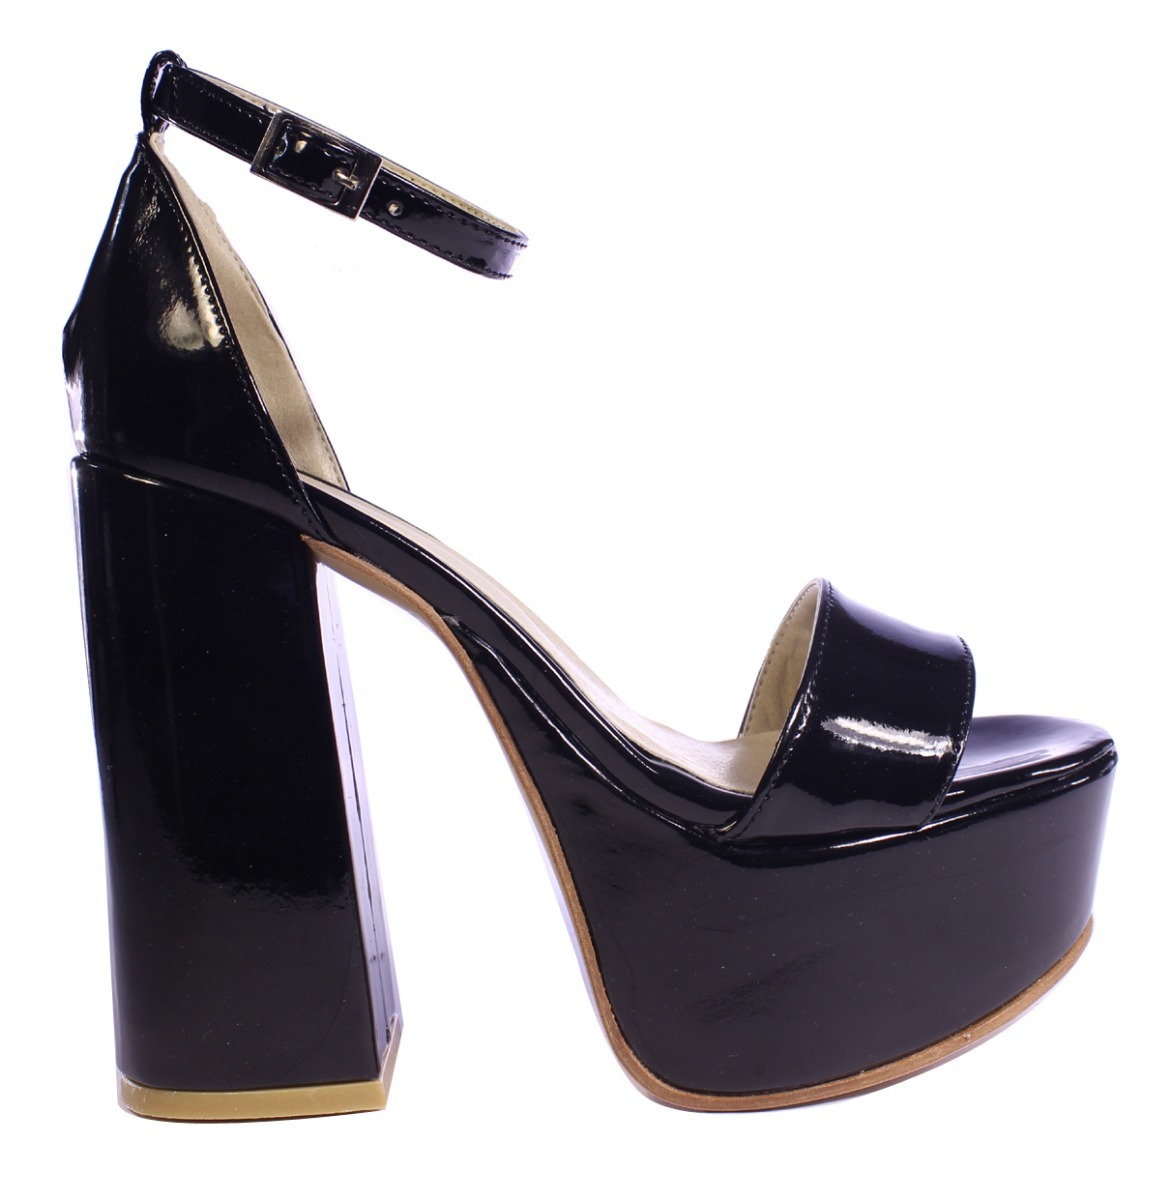 Fiesta 2 Plataforma Mujer Taco Sandalias Zapatos Verano 000 Tops qnwBEZx4xv